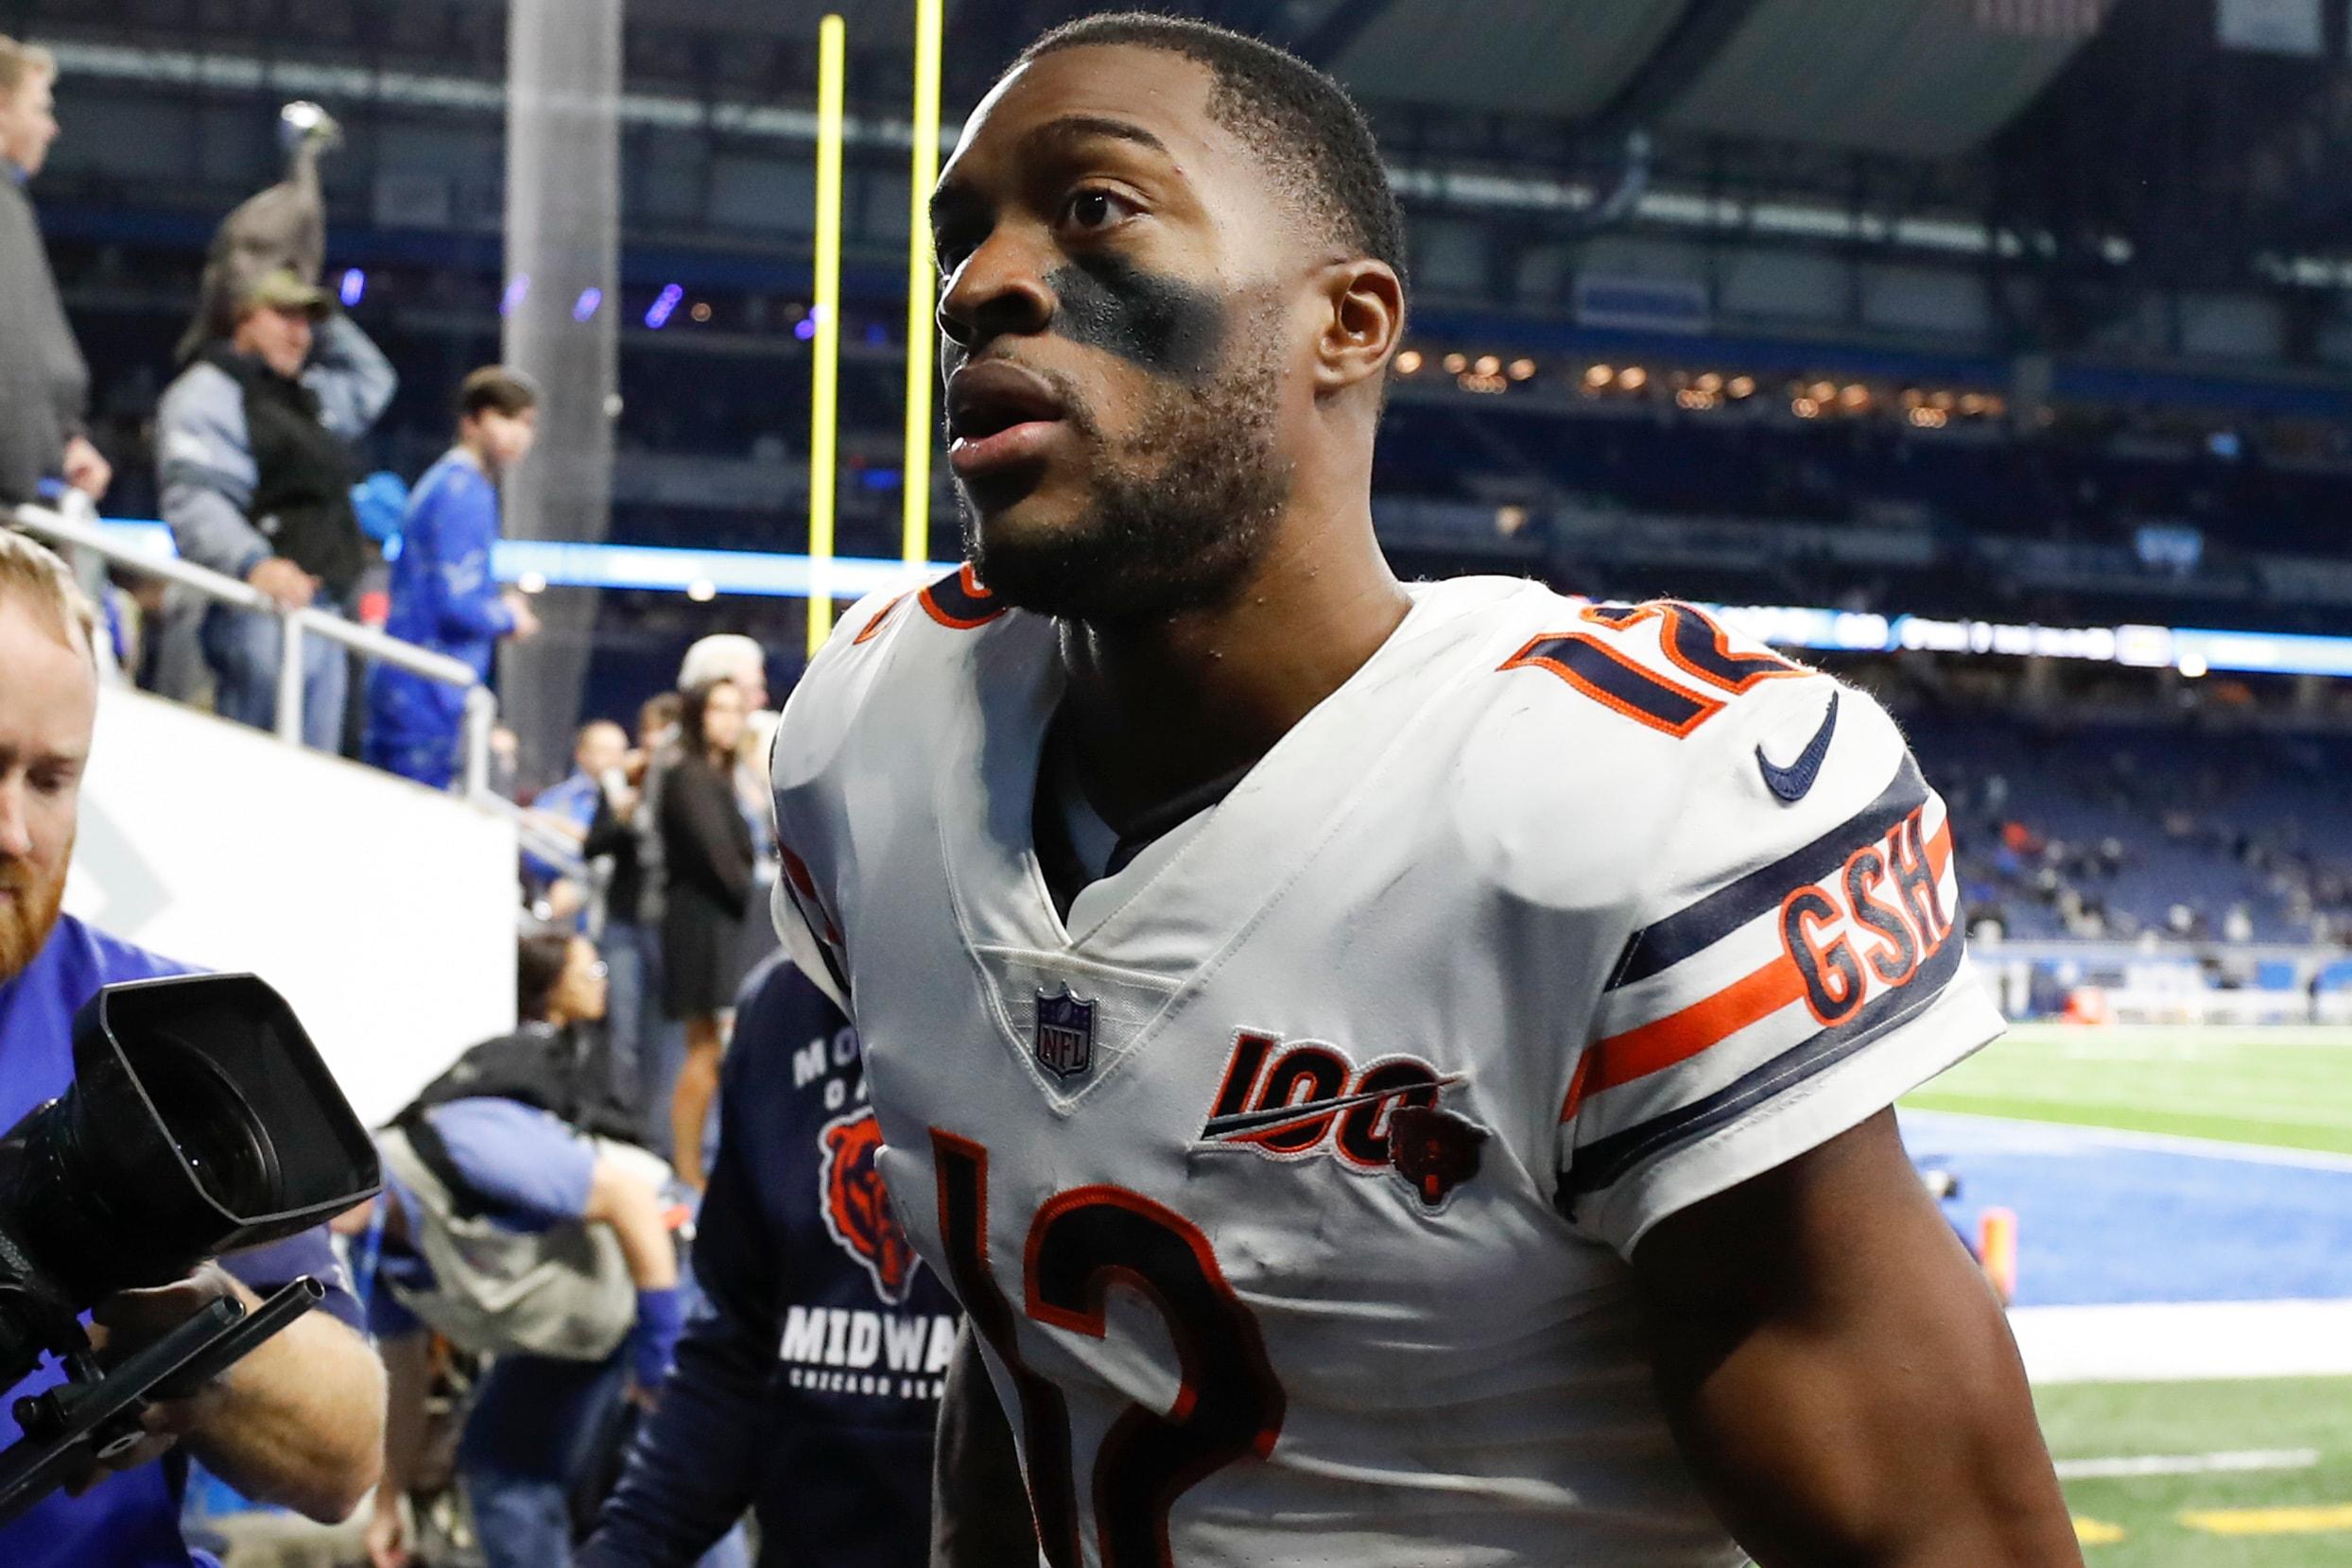 Bears' Robinson not expecting trade despite contract squabble